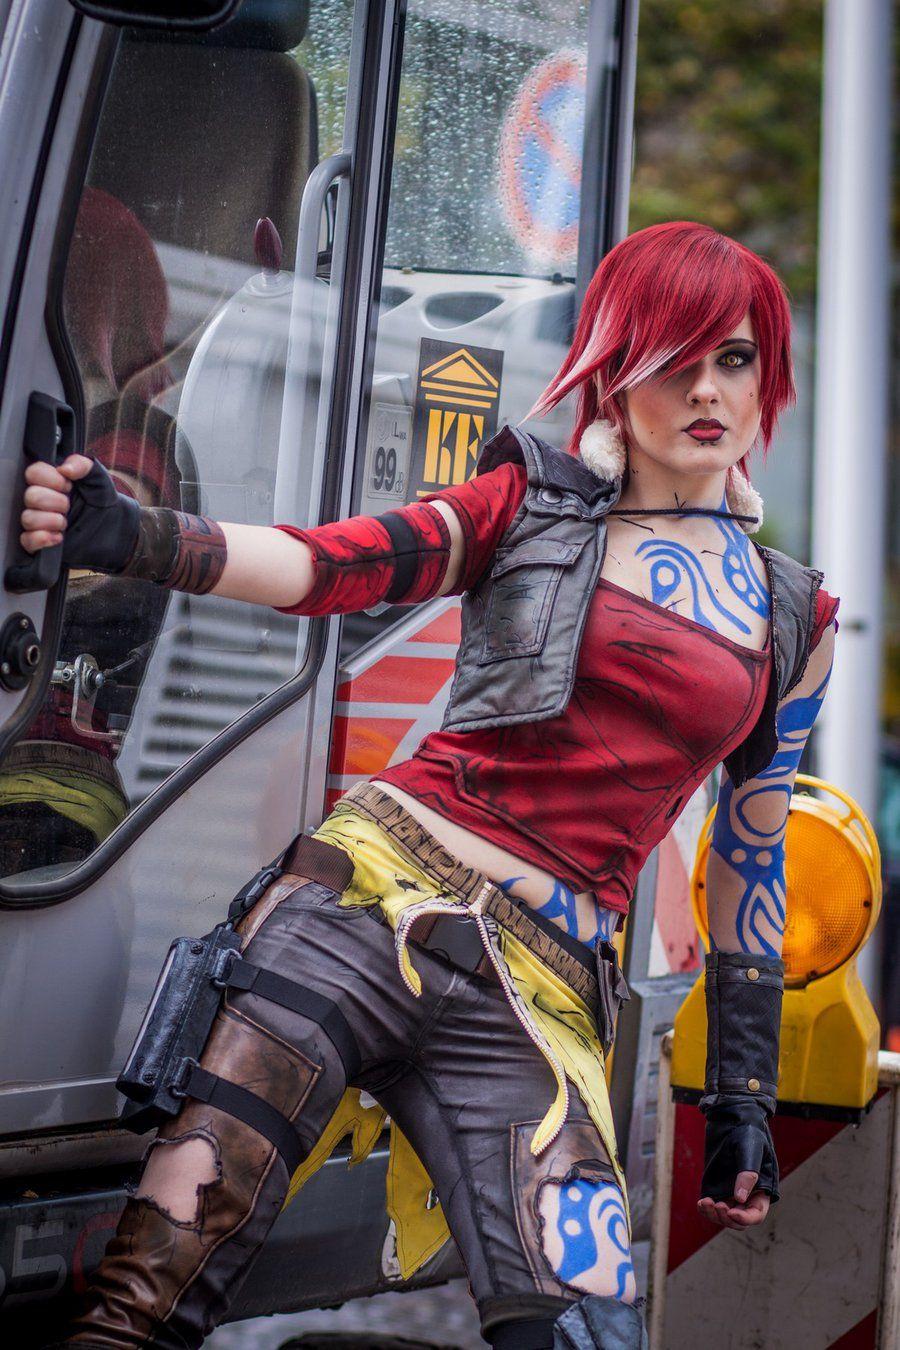 lilith the siren firehawk borderlands cosplay